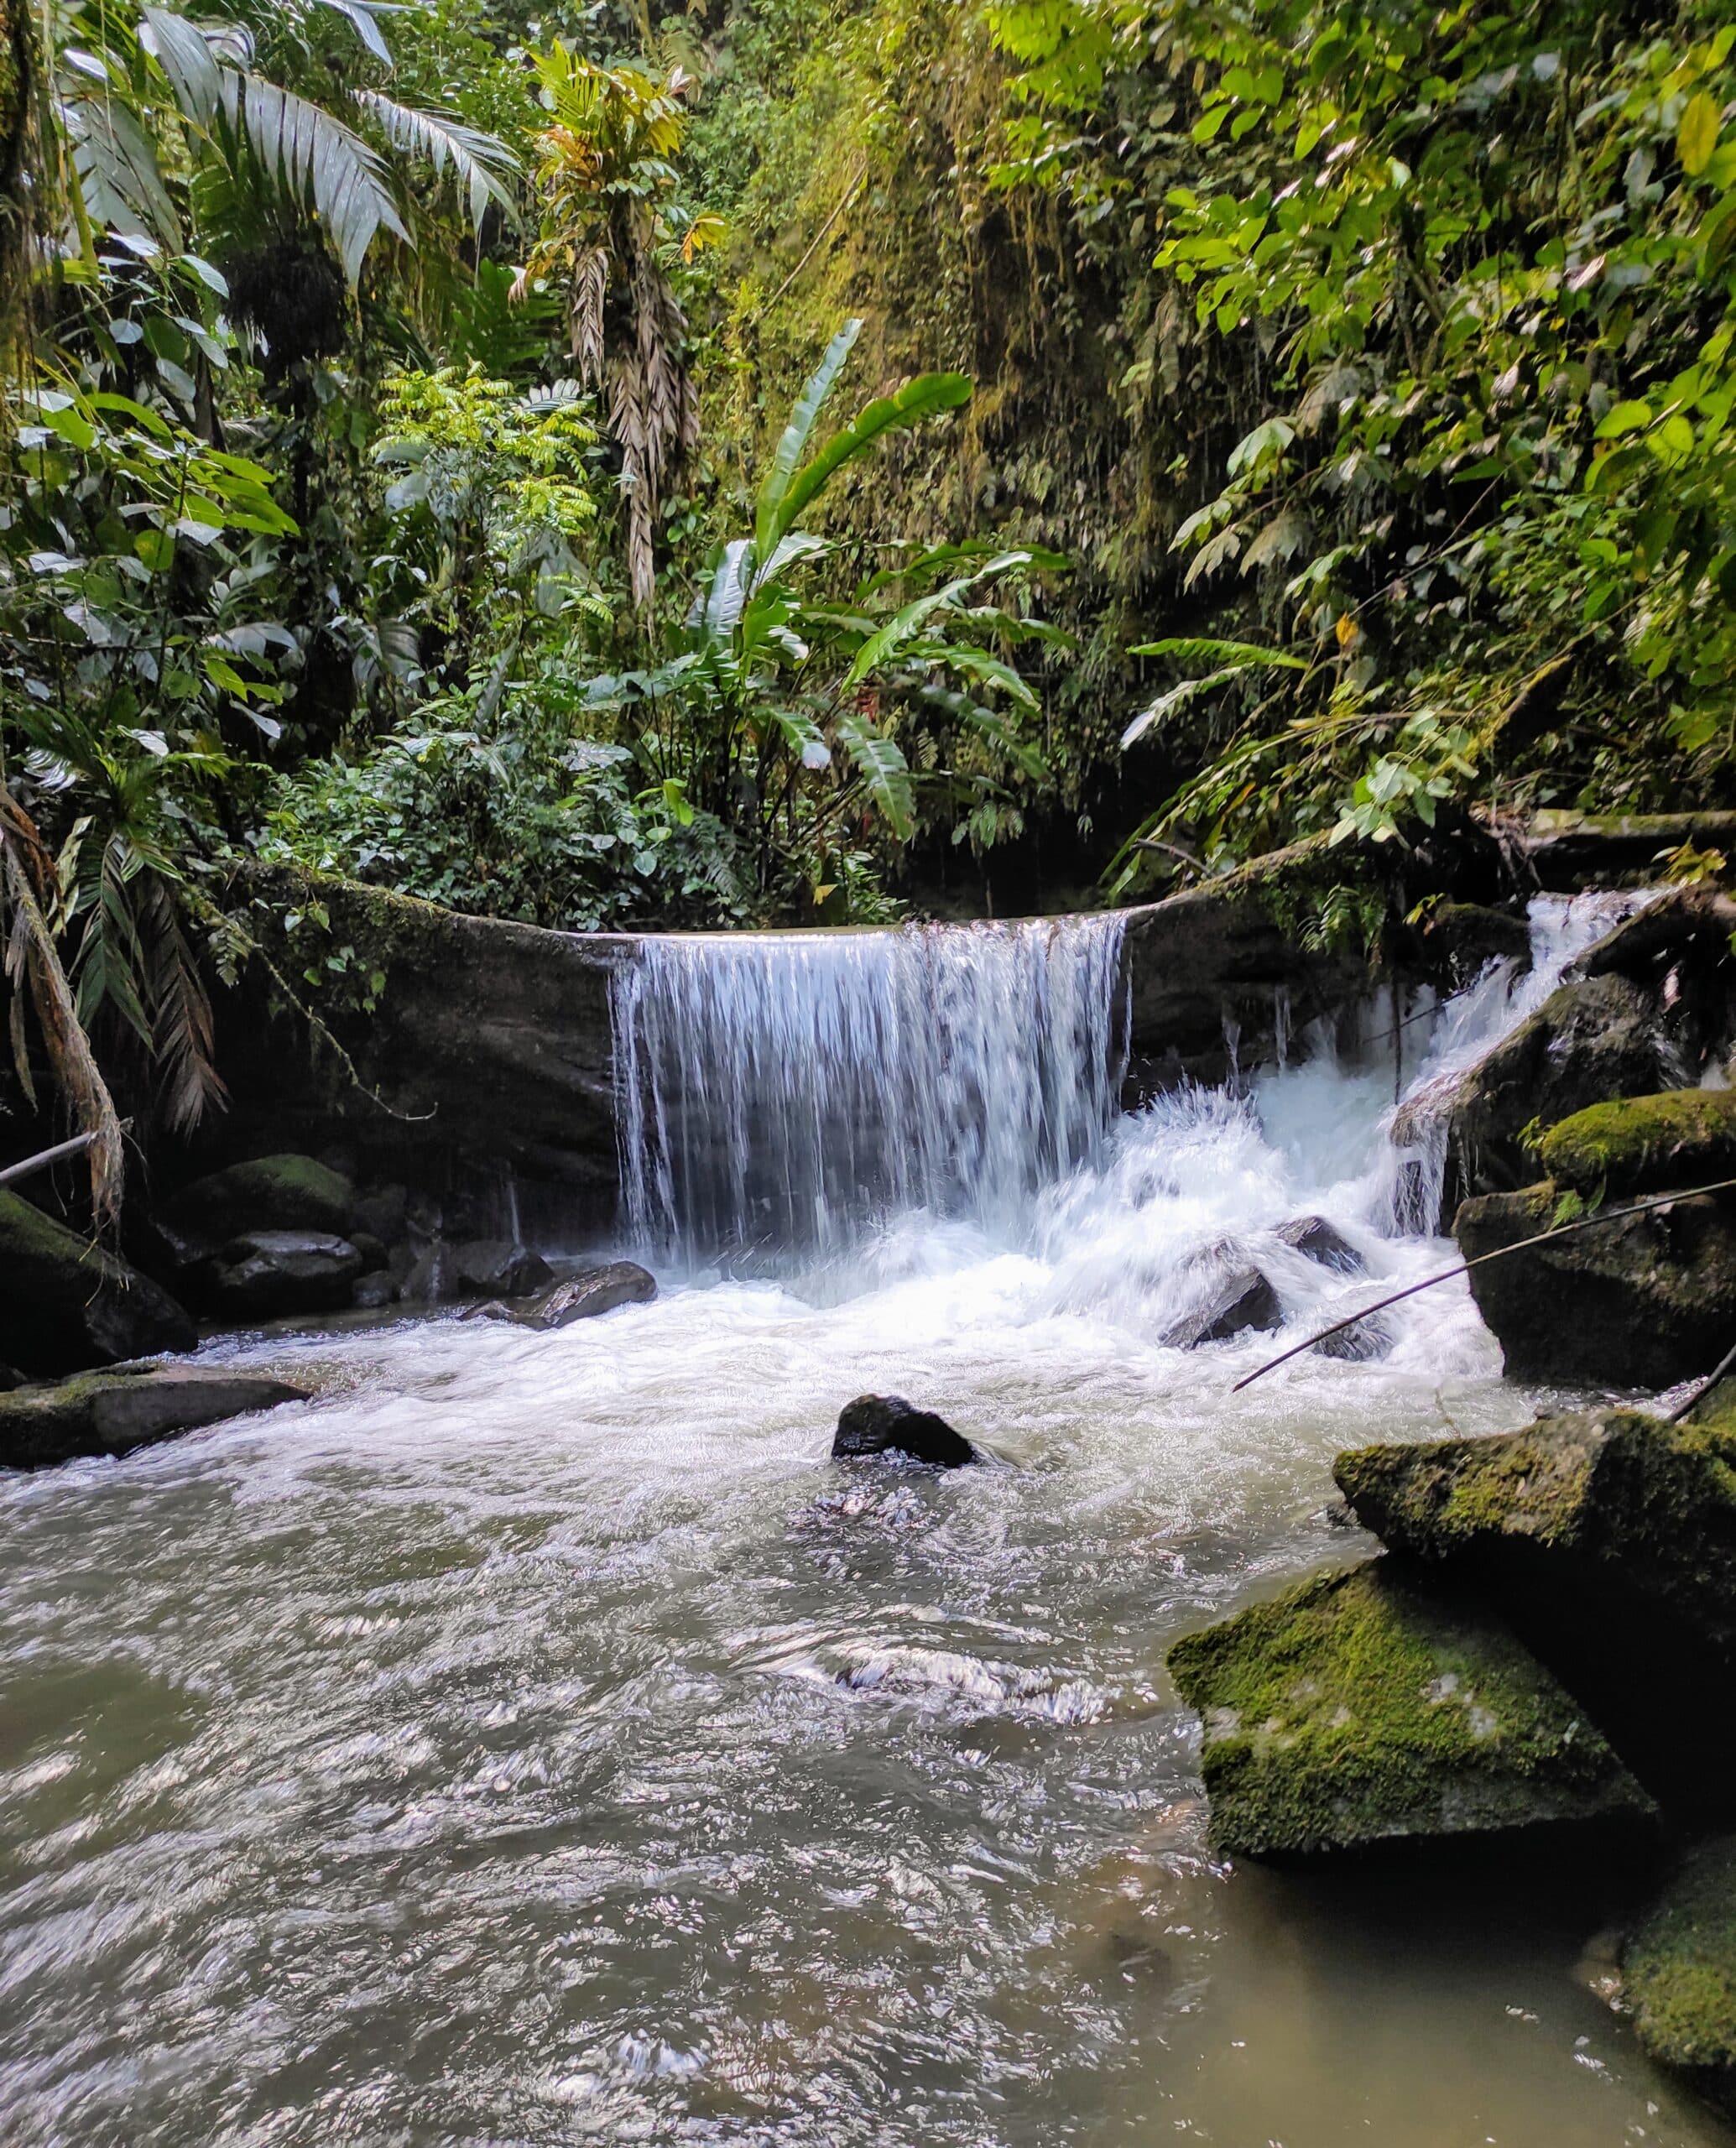 Waterfall, San Francisco de Borja, Napo Province ©Jacqueline Granda